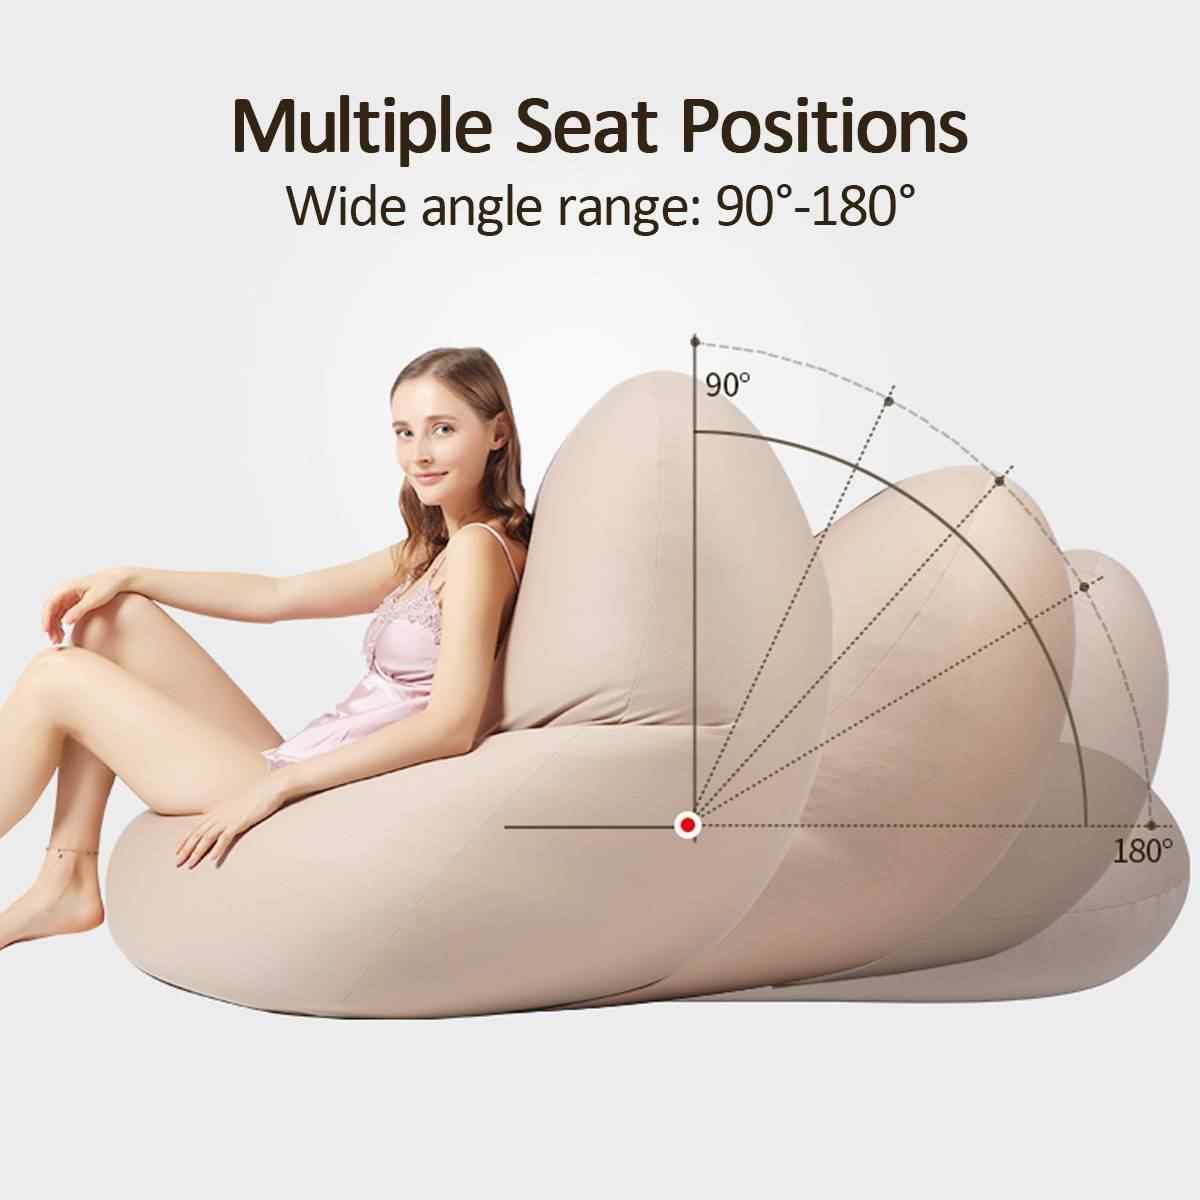 Fundas impermeables para sofás, sillas sin relleno, ropa de cama, tumbona, bolsa de asiento, Puff, sofá, Tatami, sala de estar